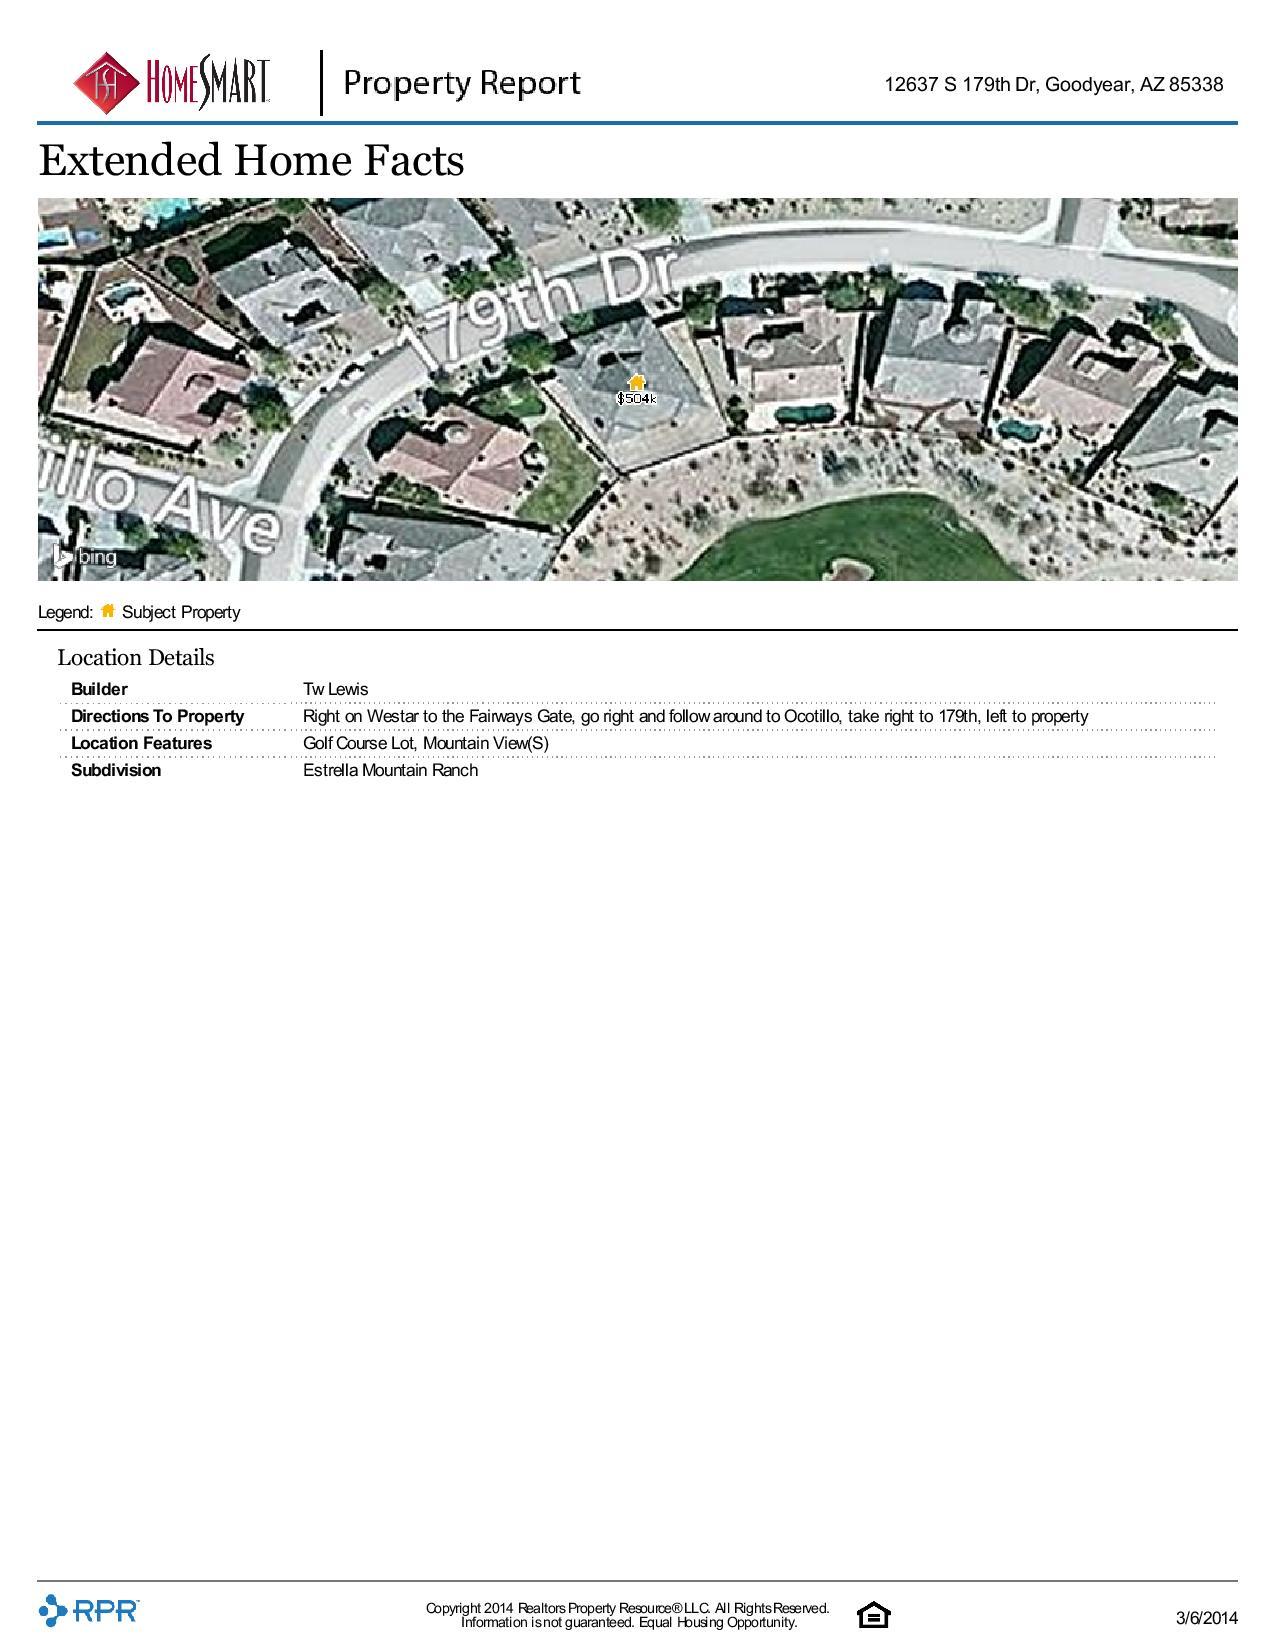 12637-S-179th-Dr-Goodyear-AZ-85338-page-004